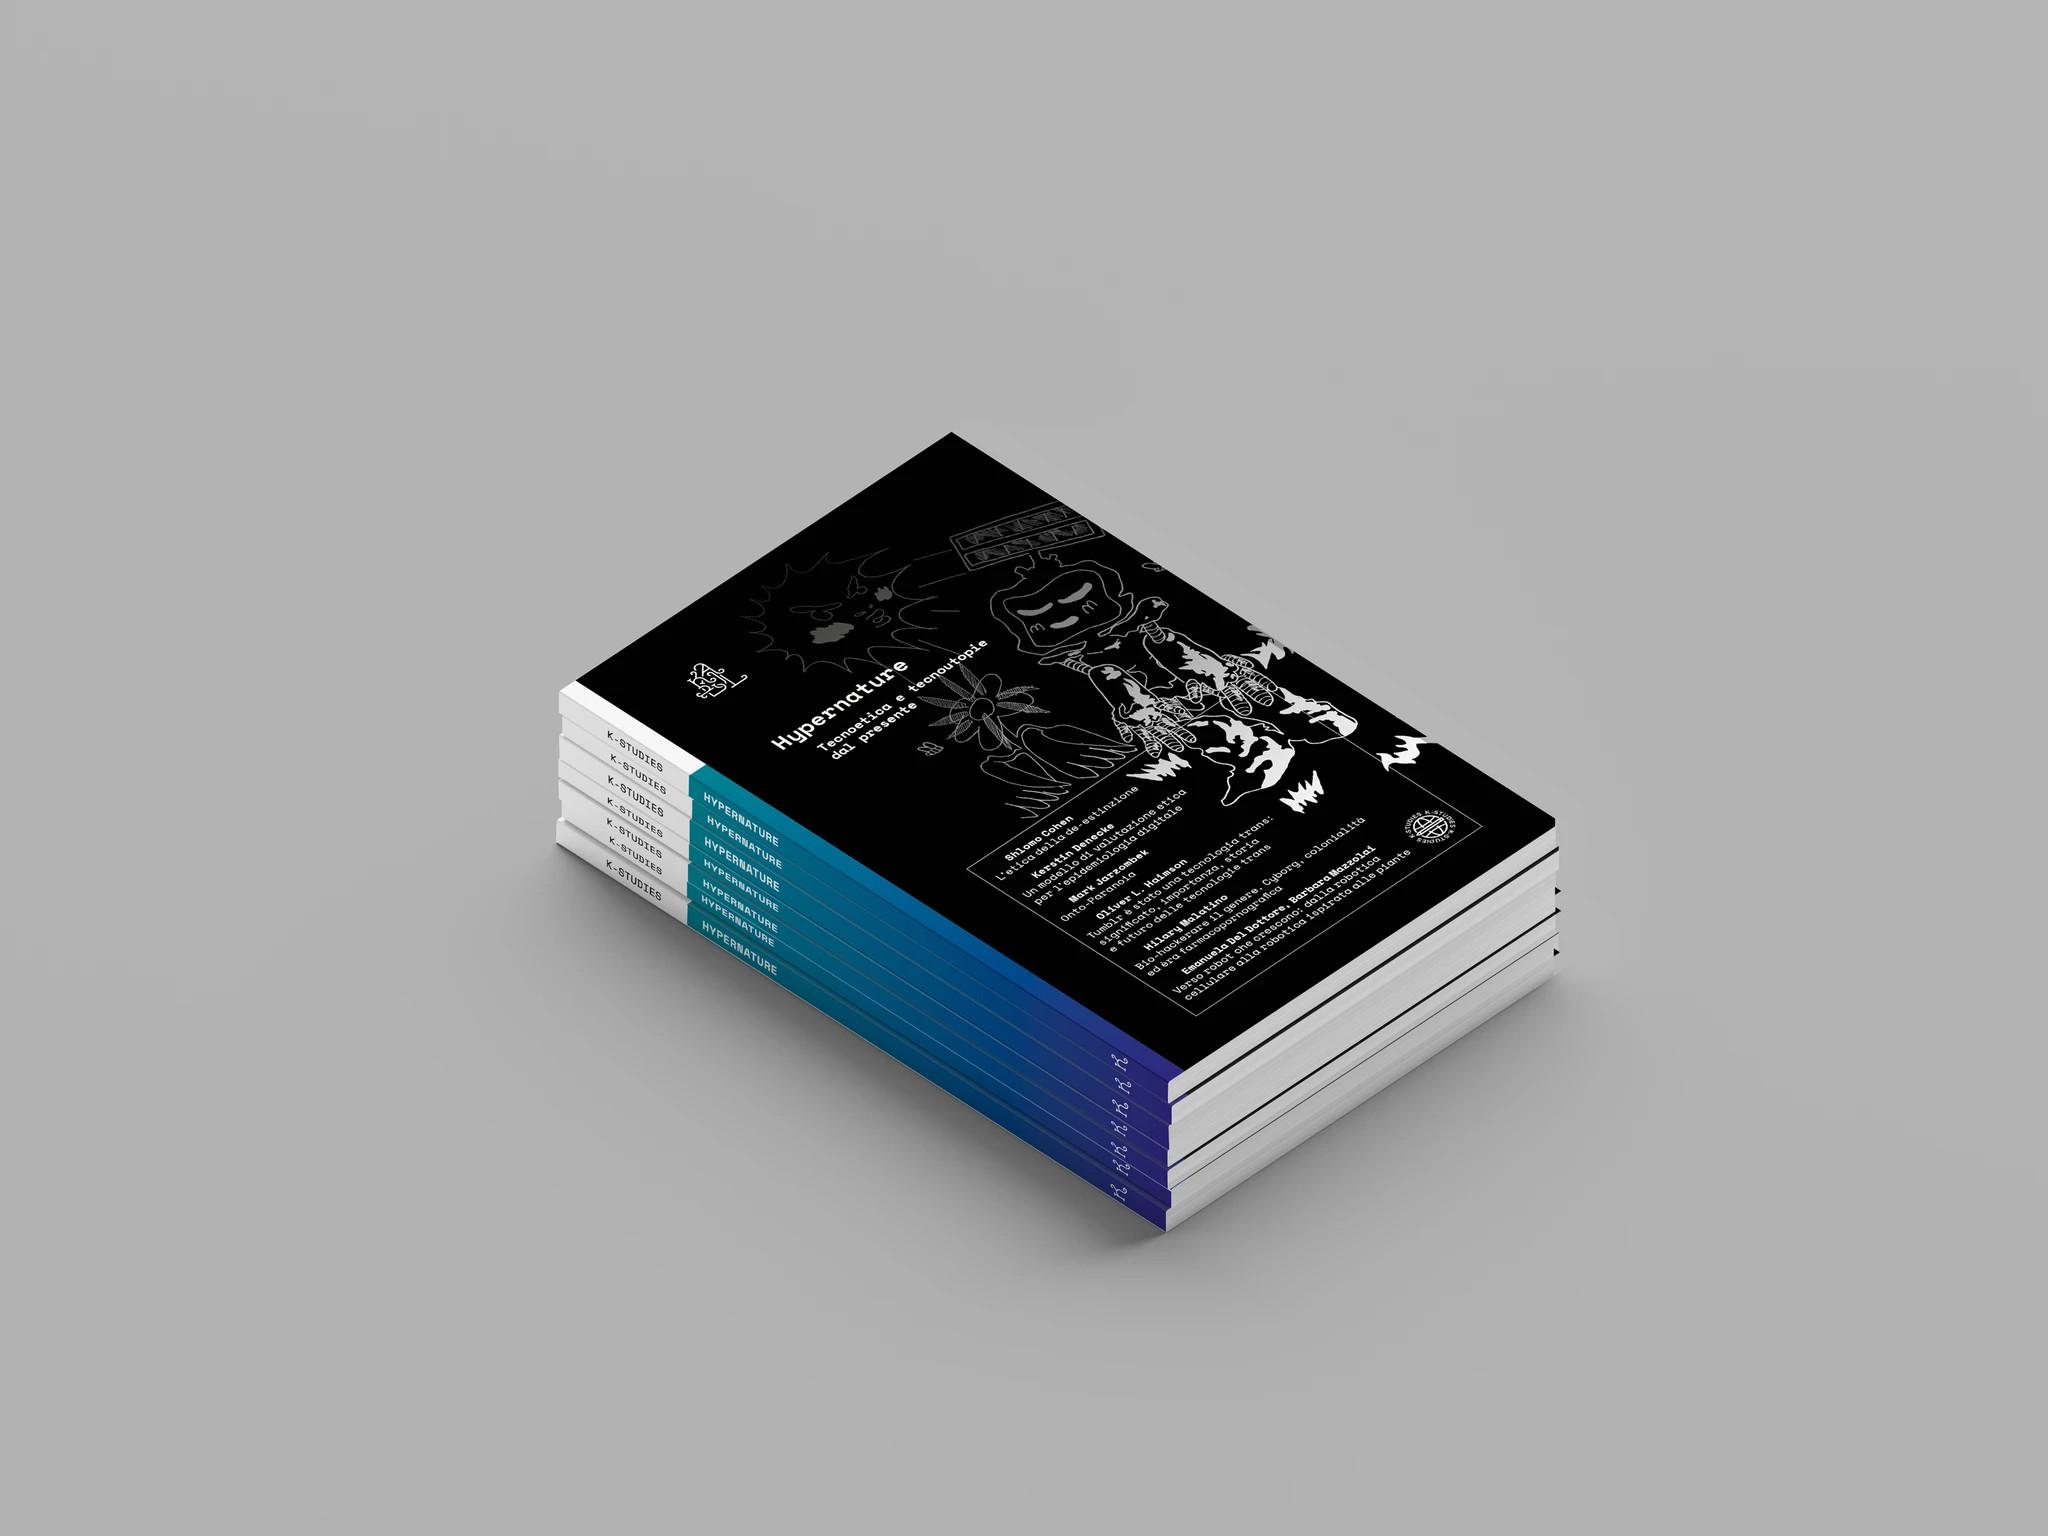 I K-studies di KABUL magazine: Hypernature. Tecnoetica e tecnoutopie del presente